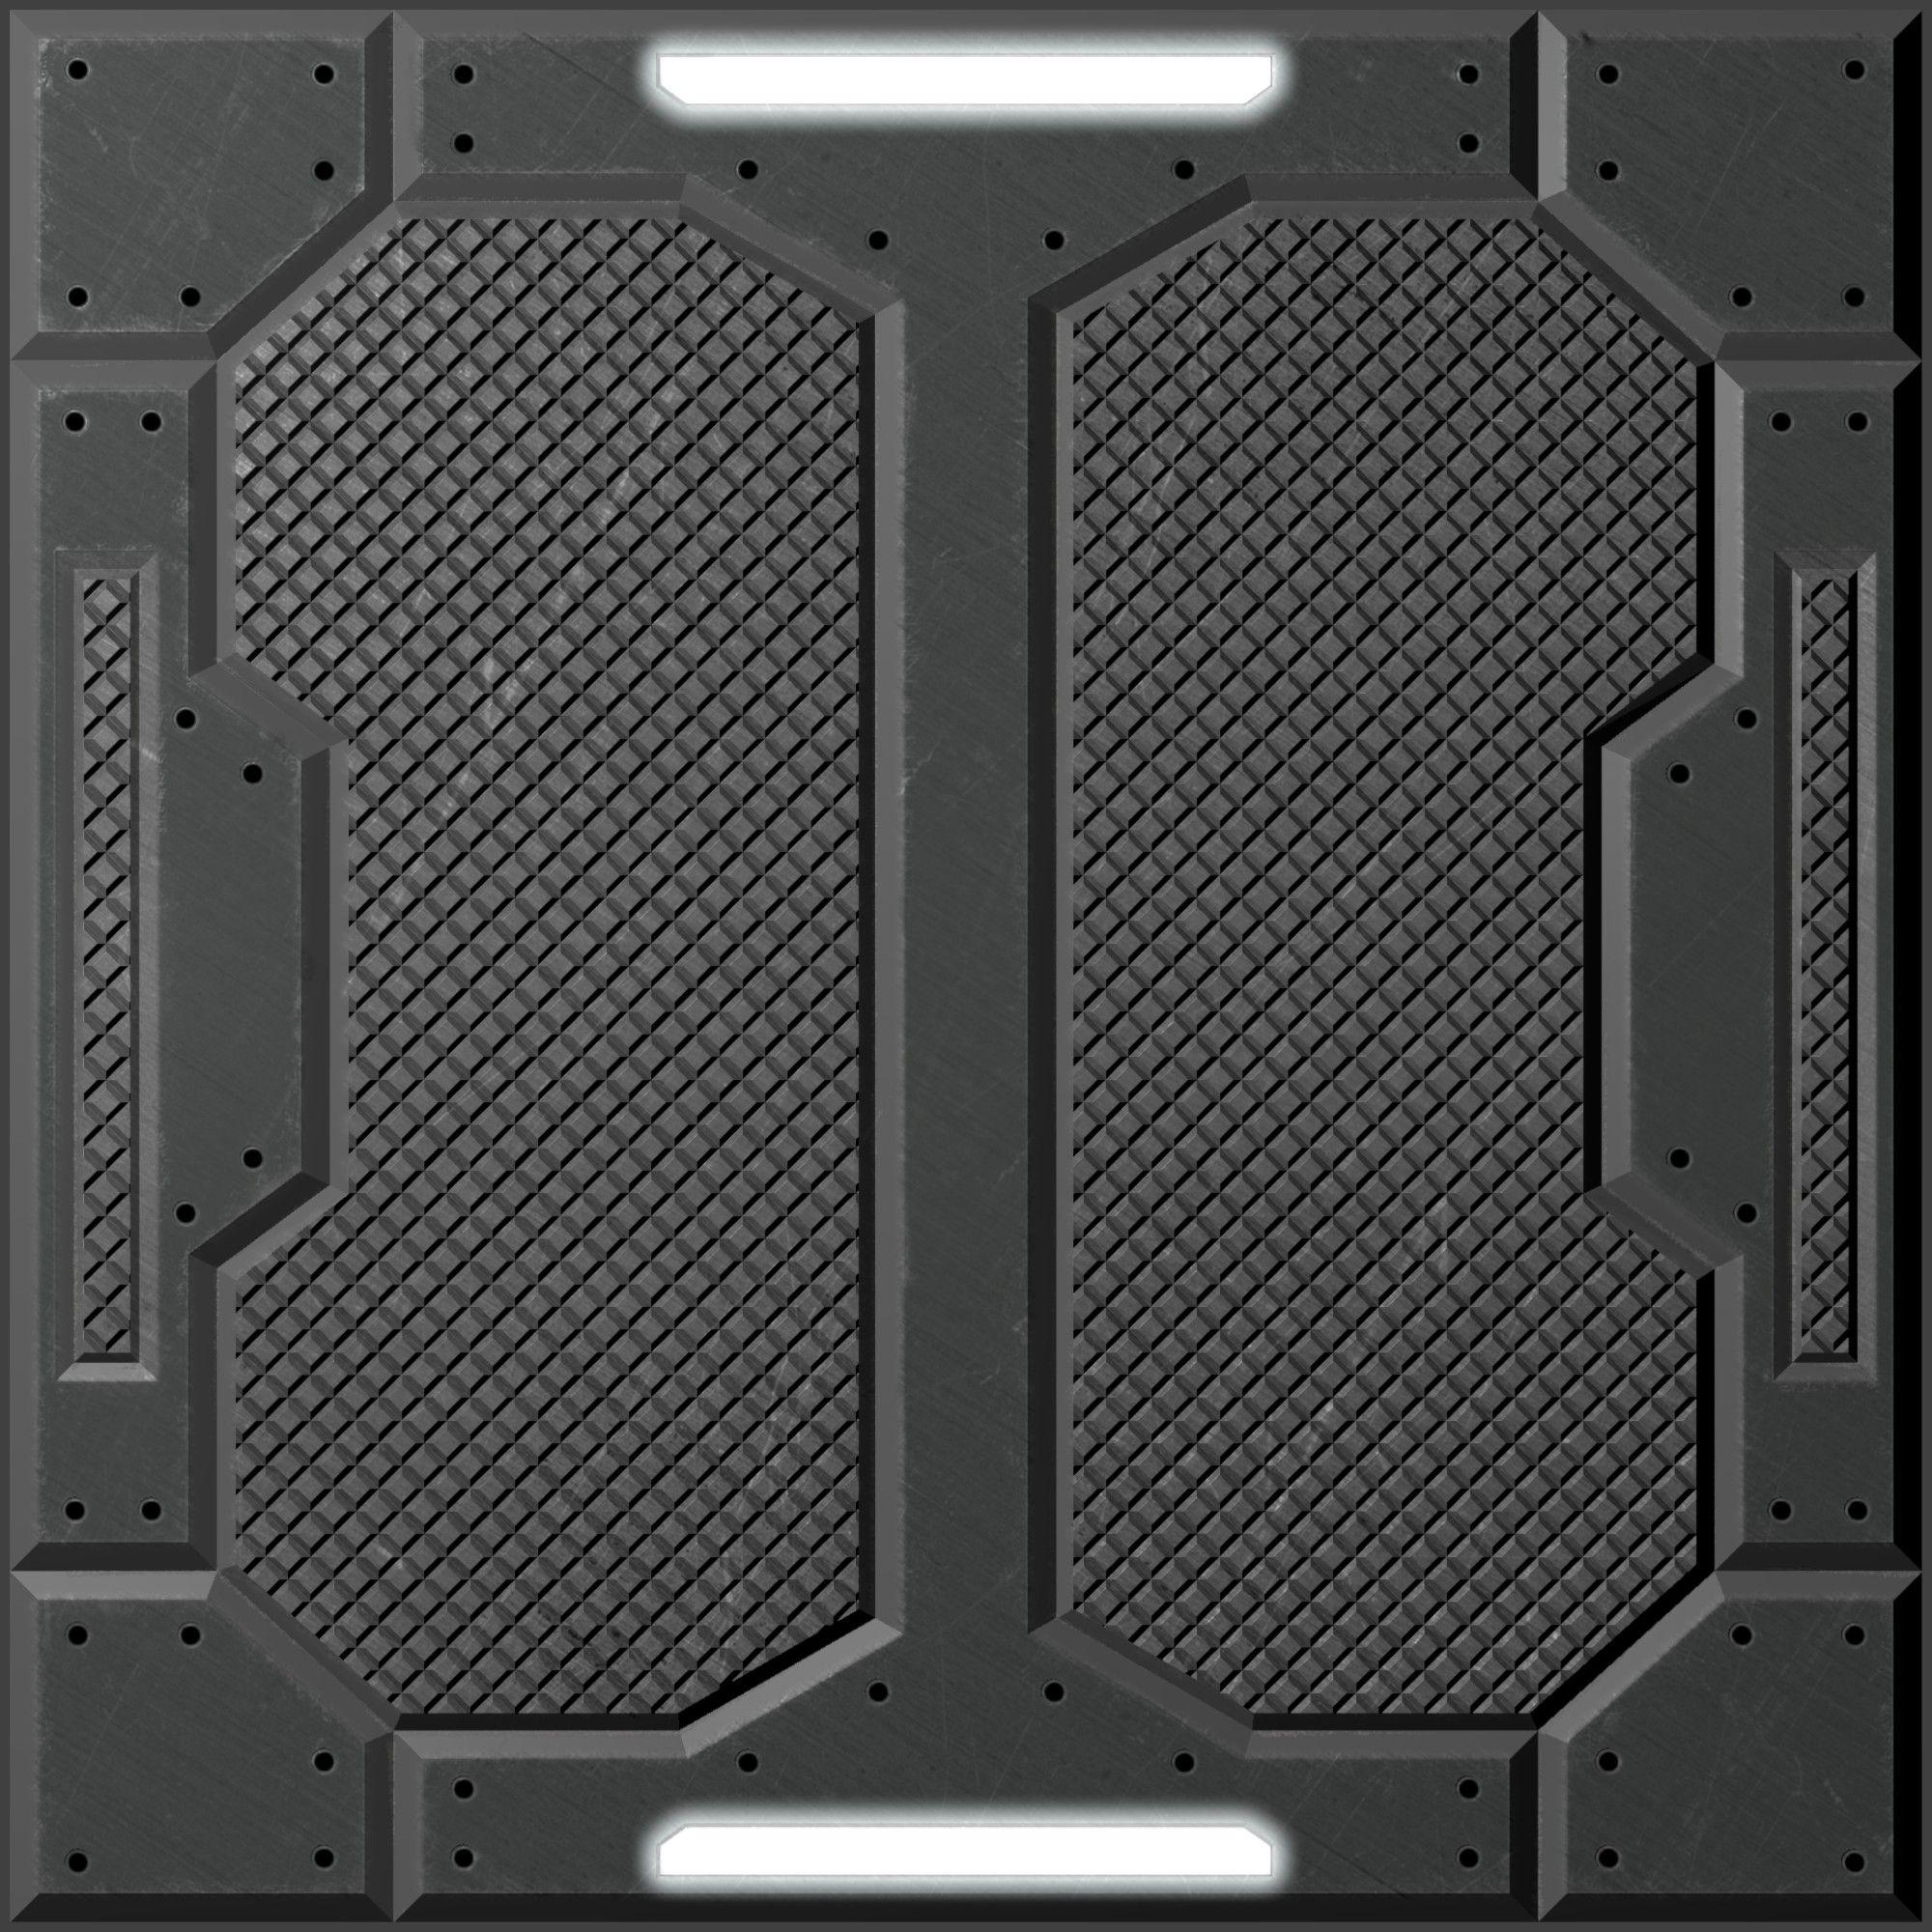 white scifi textures - Google Search | Sci-fi level tiles ...